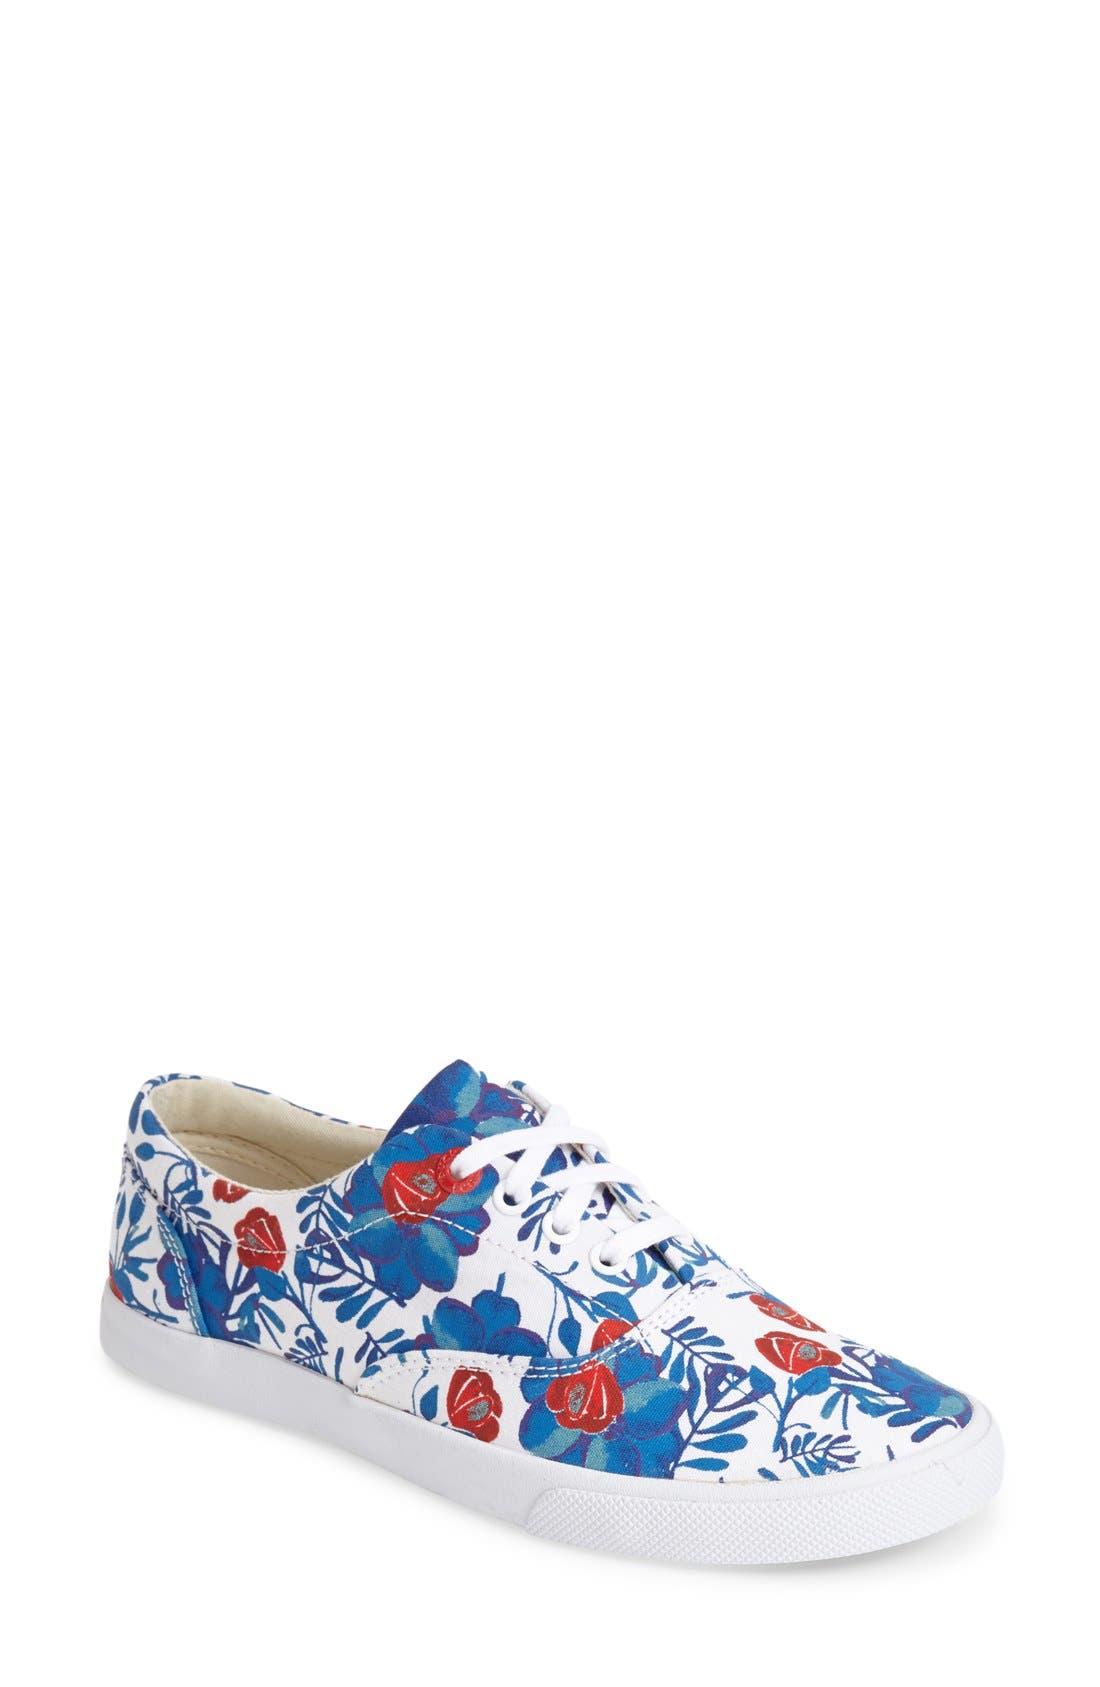 'Floral' Sneaker,                             Main thumbnail 1, color,                             400